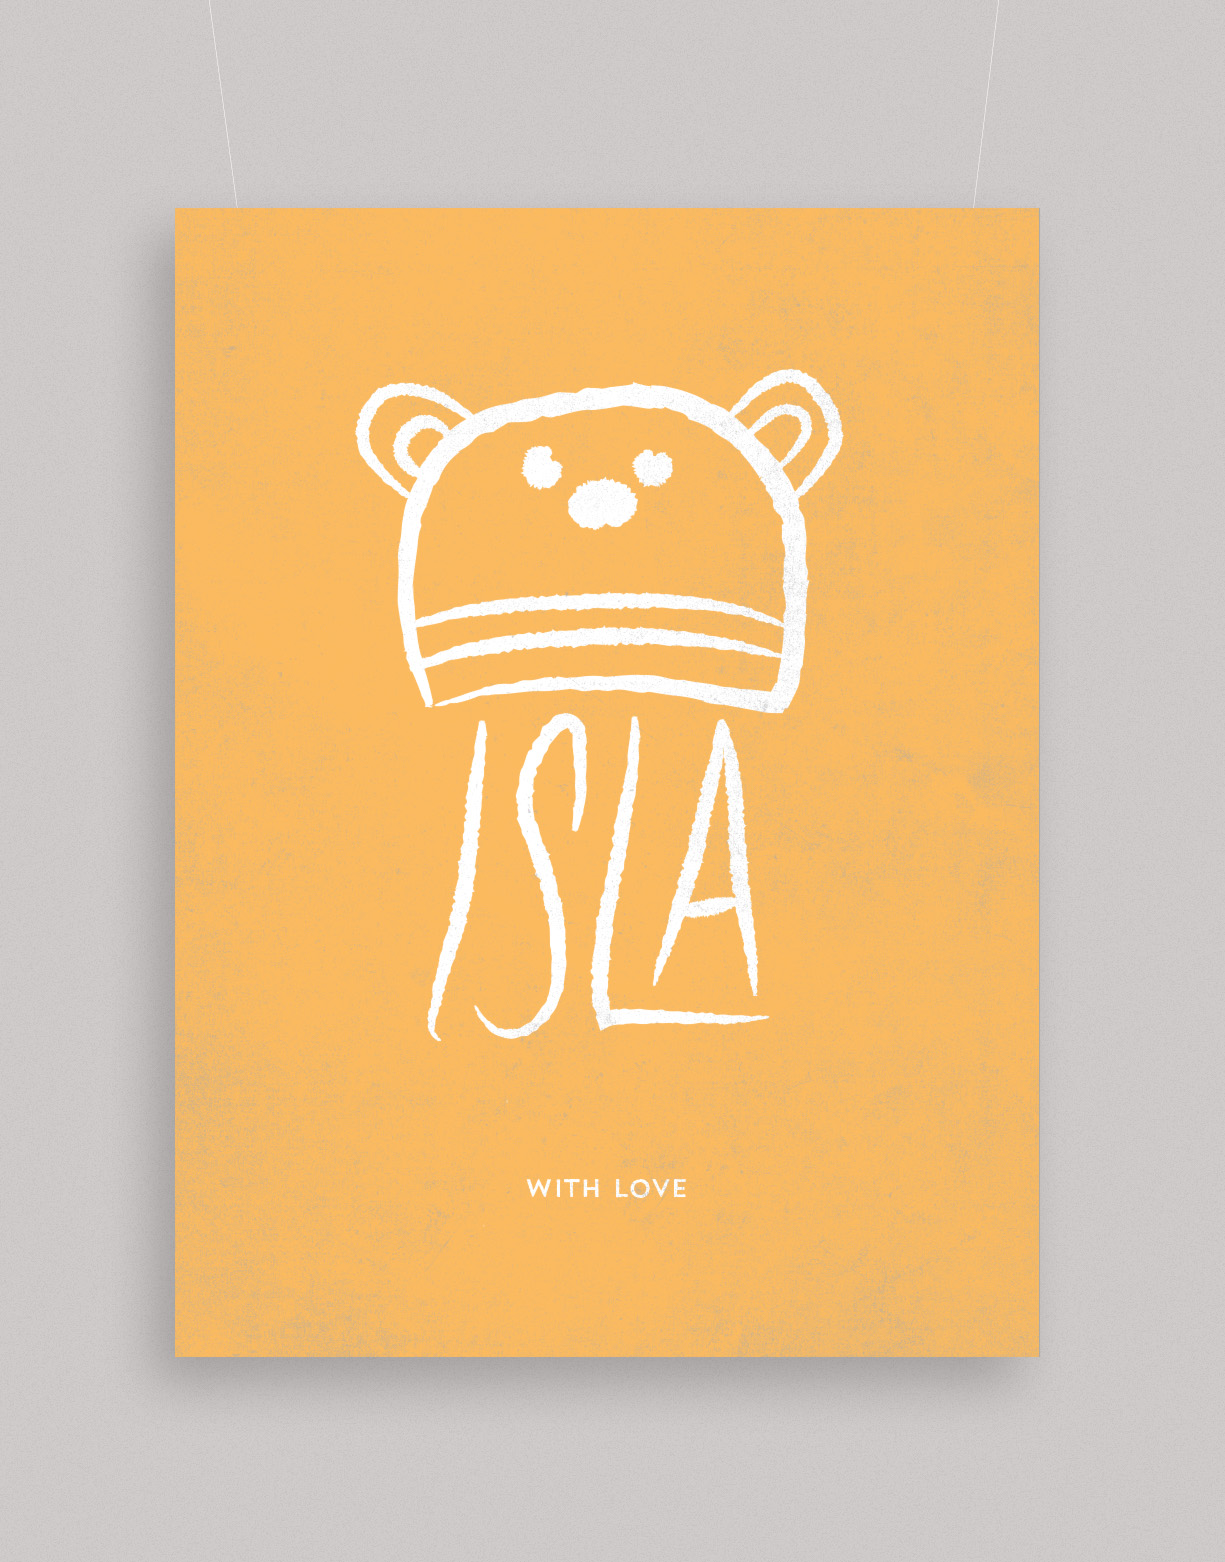 Posters_Isla 02.jpg